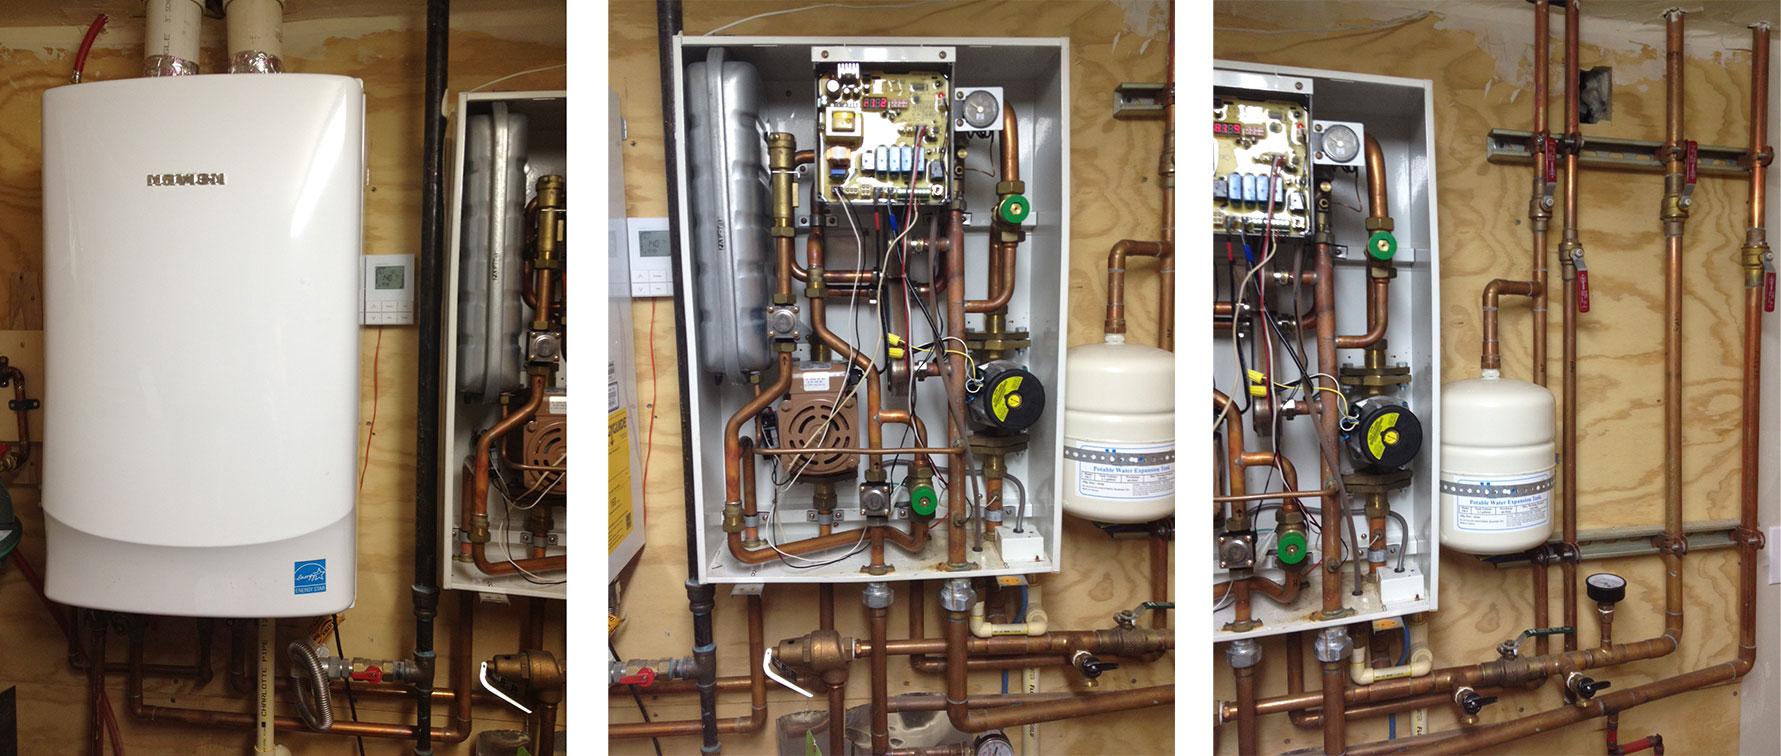 Gas boiler Navien: reviews. Gas boiler Navien: price and features